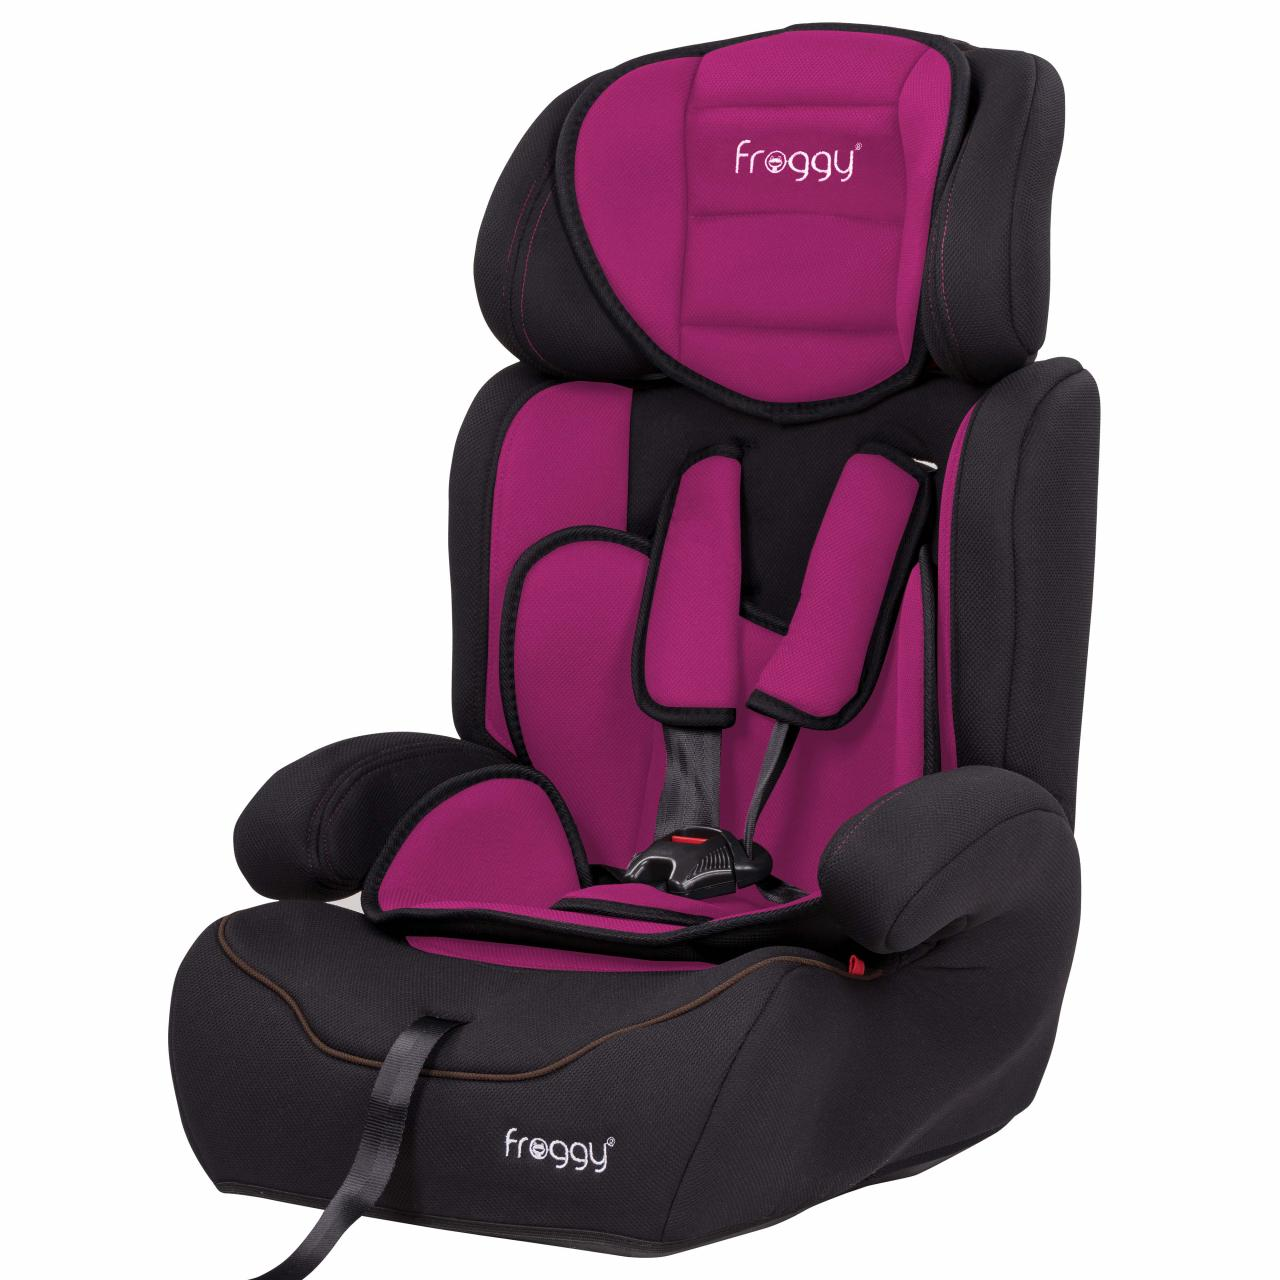 Kinderautositz-Autositz-Kinder-Autokindersitz-Kindersitz-9-36kg-Gruppe-1-2-3